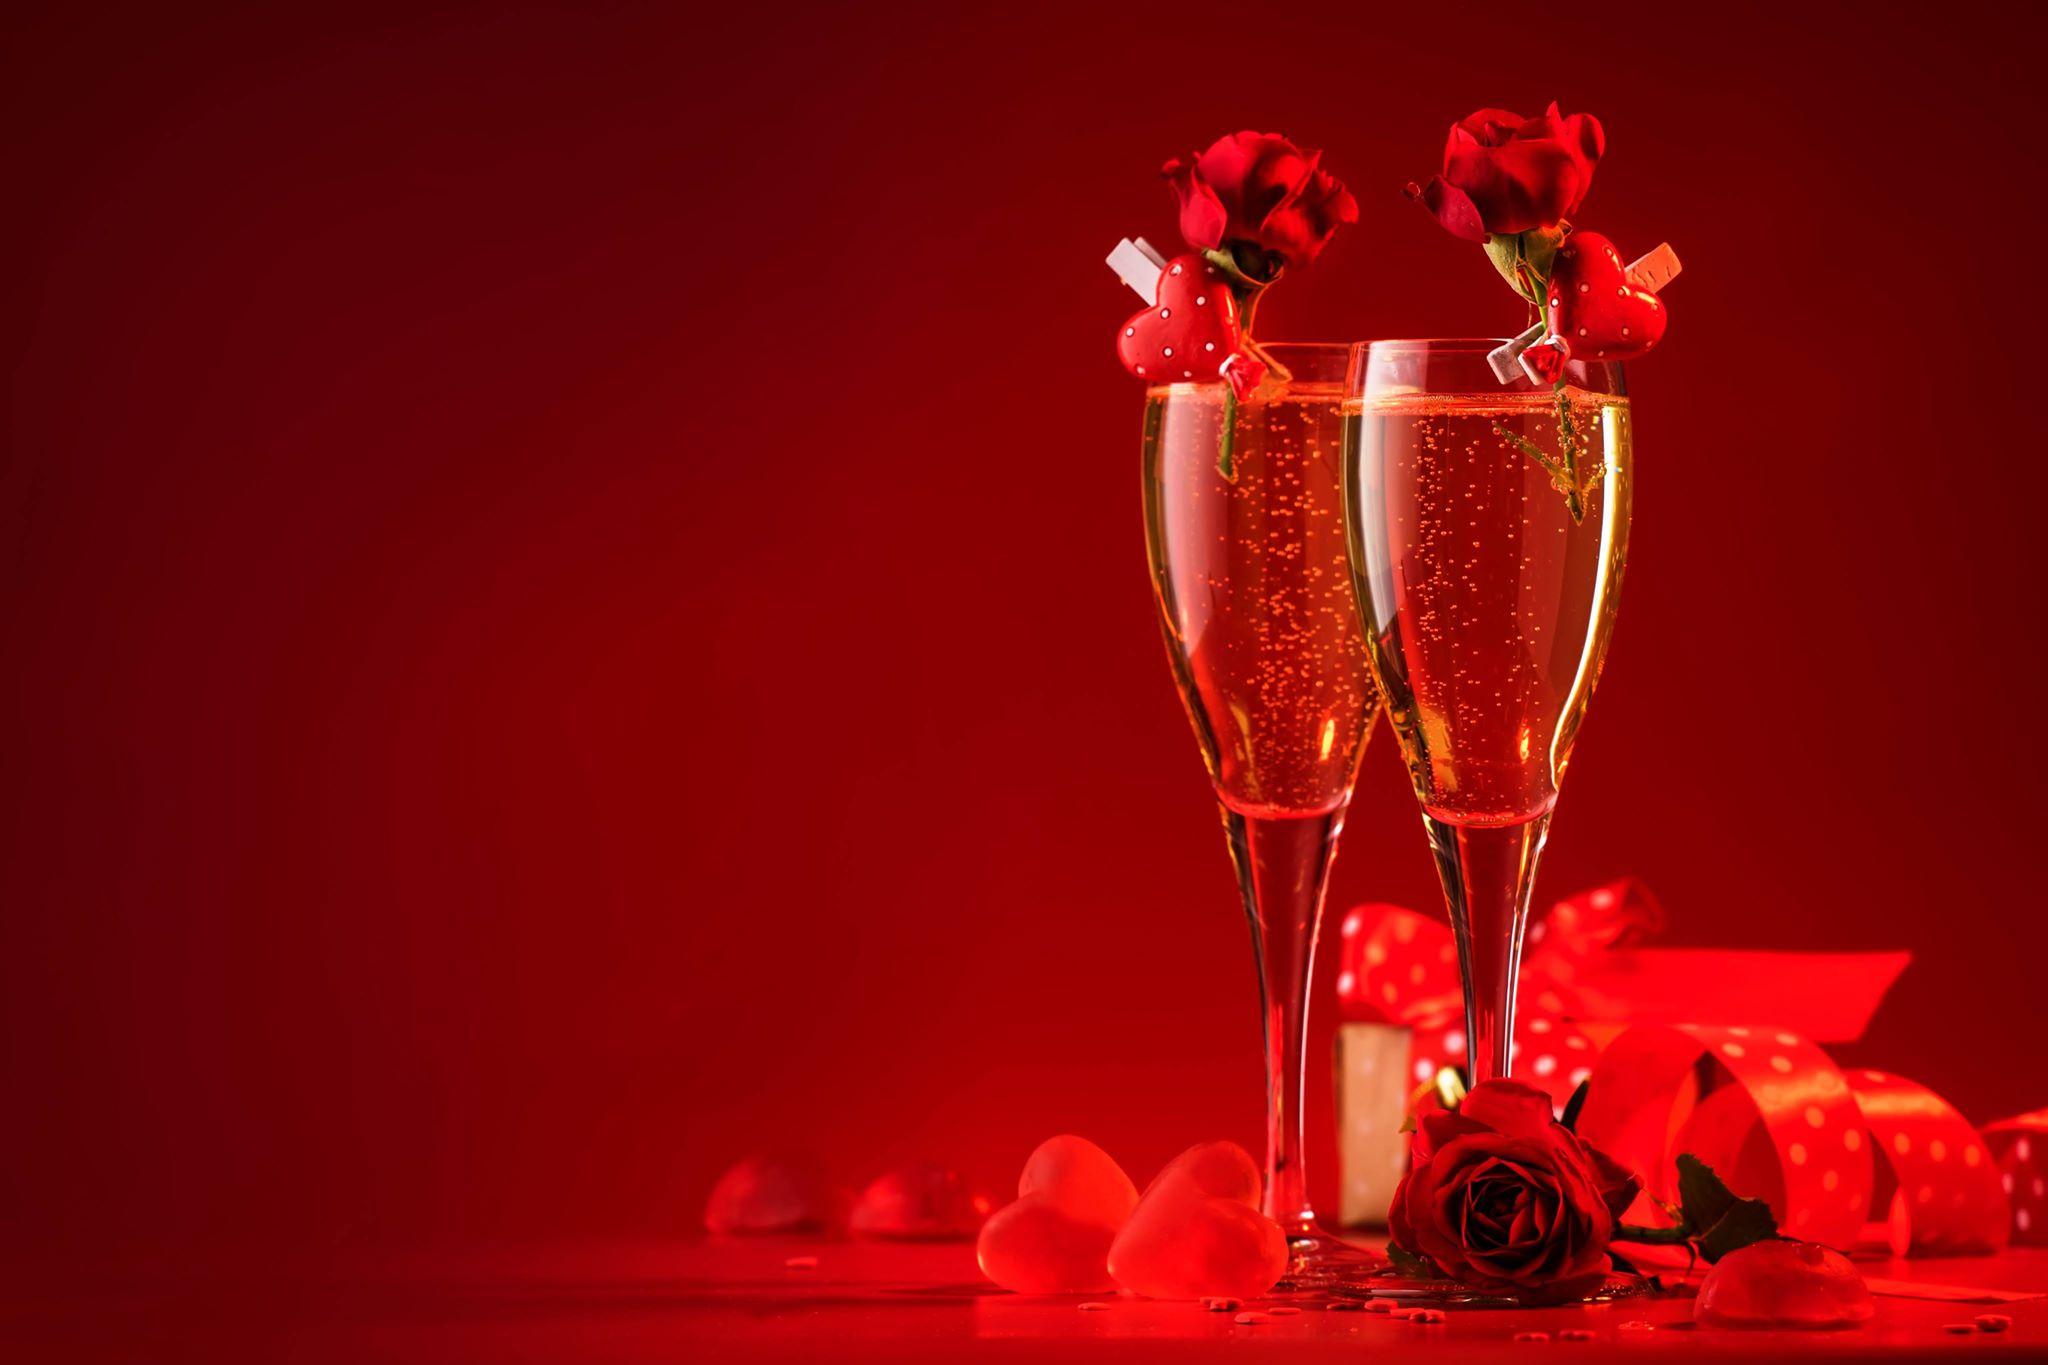 Valentines day images 30 صور عيد الحب